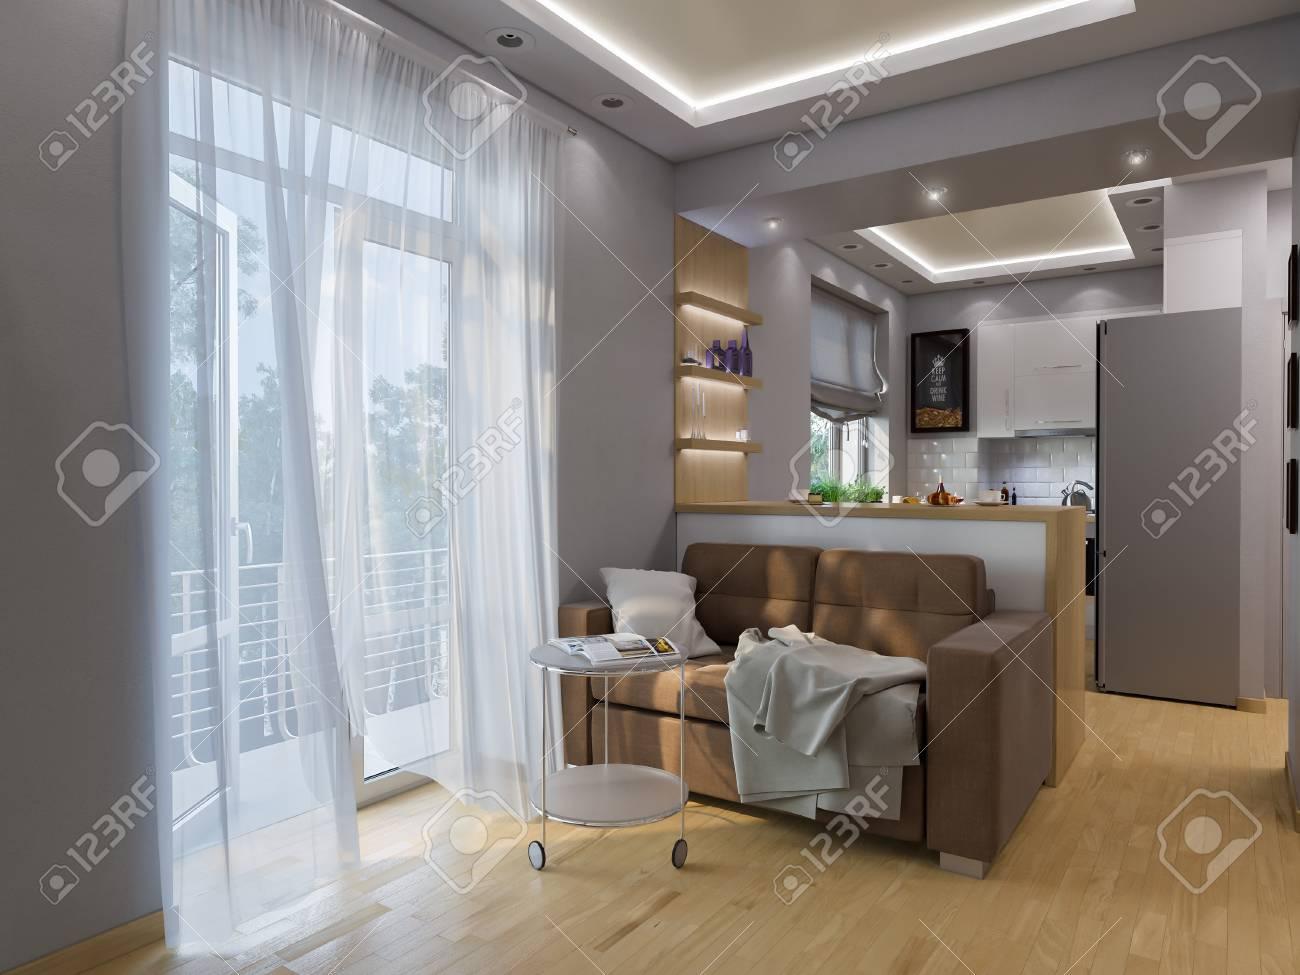 3d Illustration Living Room And Kitchen Interior Design Modern Studio Apartment In The Scandinavian Minimalist